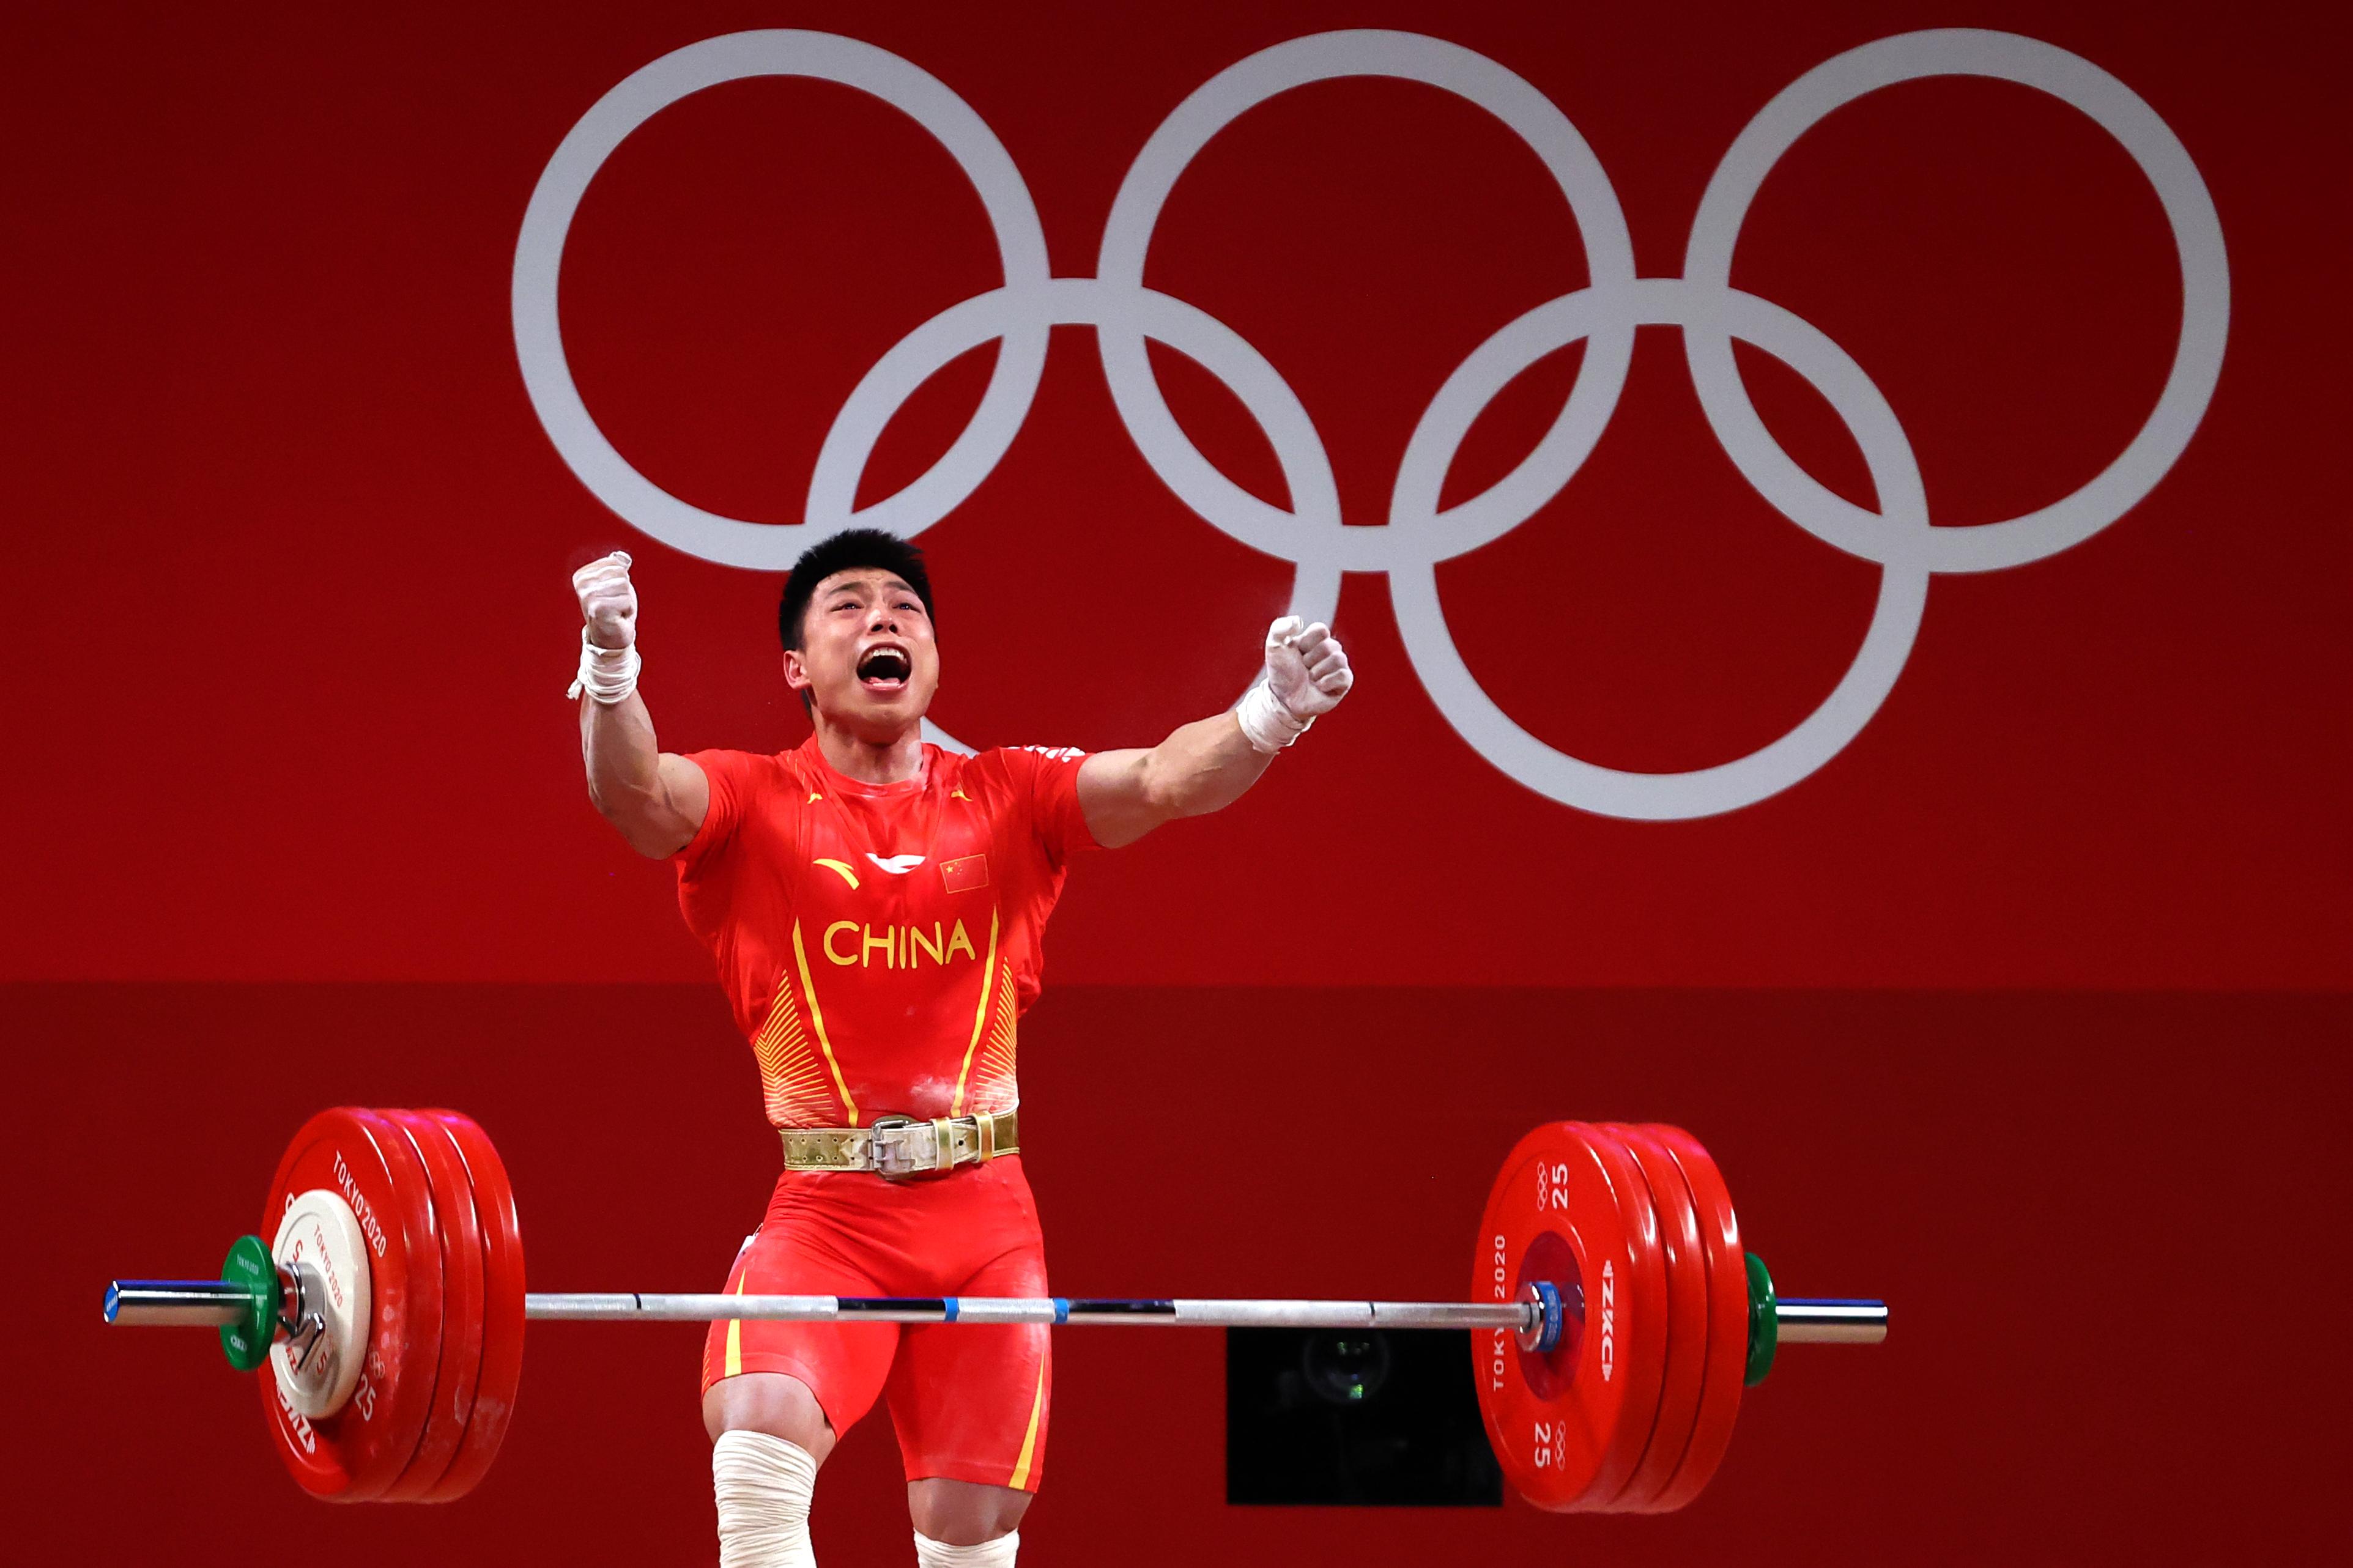 Tokyo 2020 Olympics - Weightlifting - Men's 67kg - Group A - Tokyo International Forum, Tokyo, Japan - July 25, 2021. Chen Lijun of China celebrates after a lift. REUTERS/Edgard Garrido